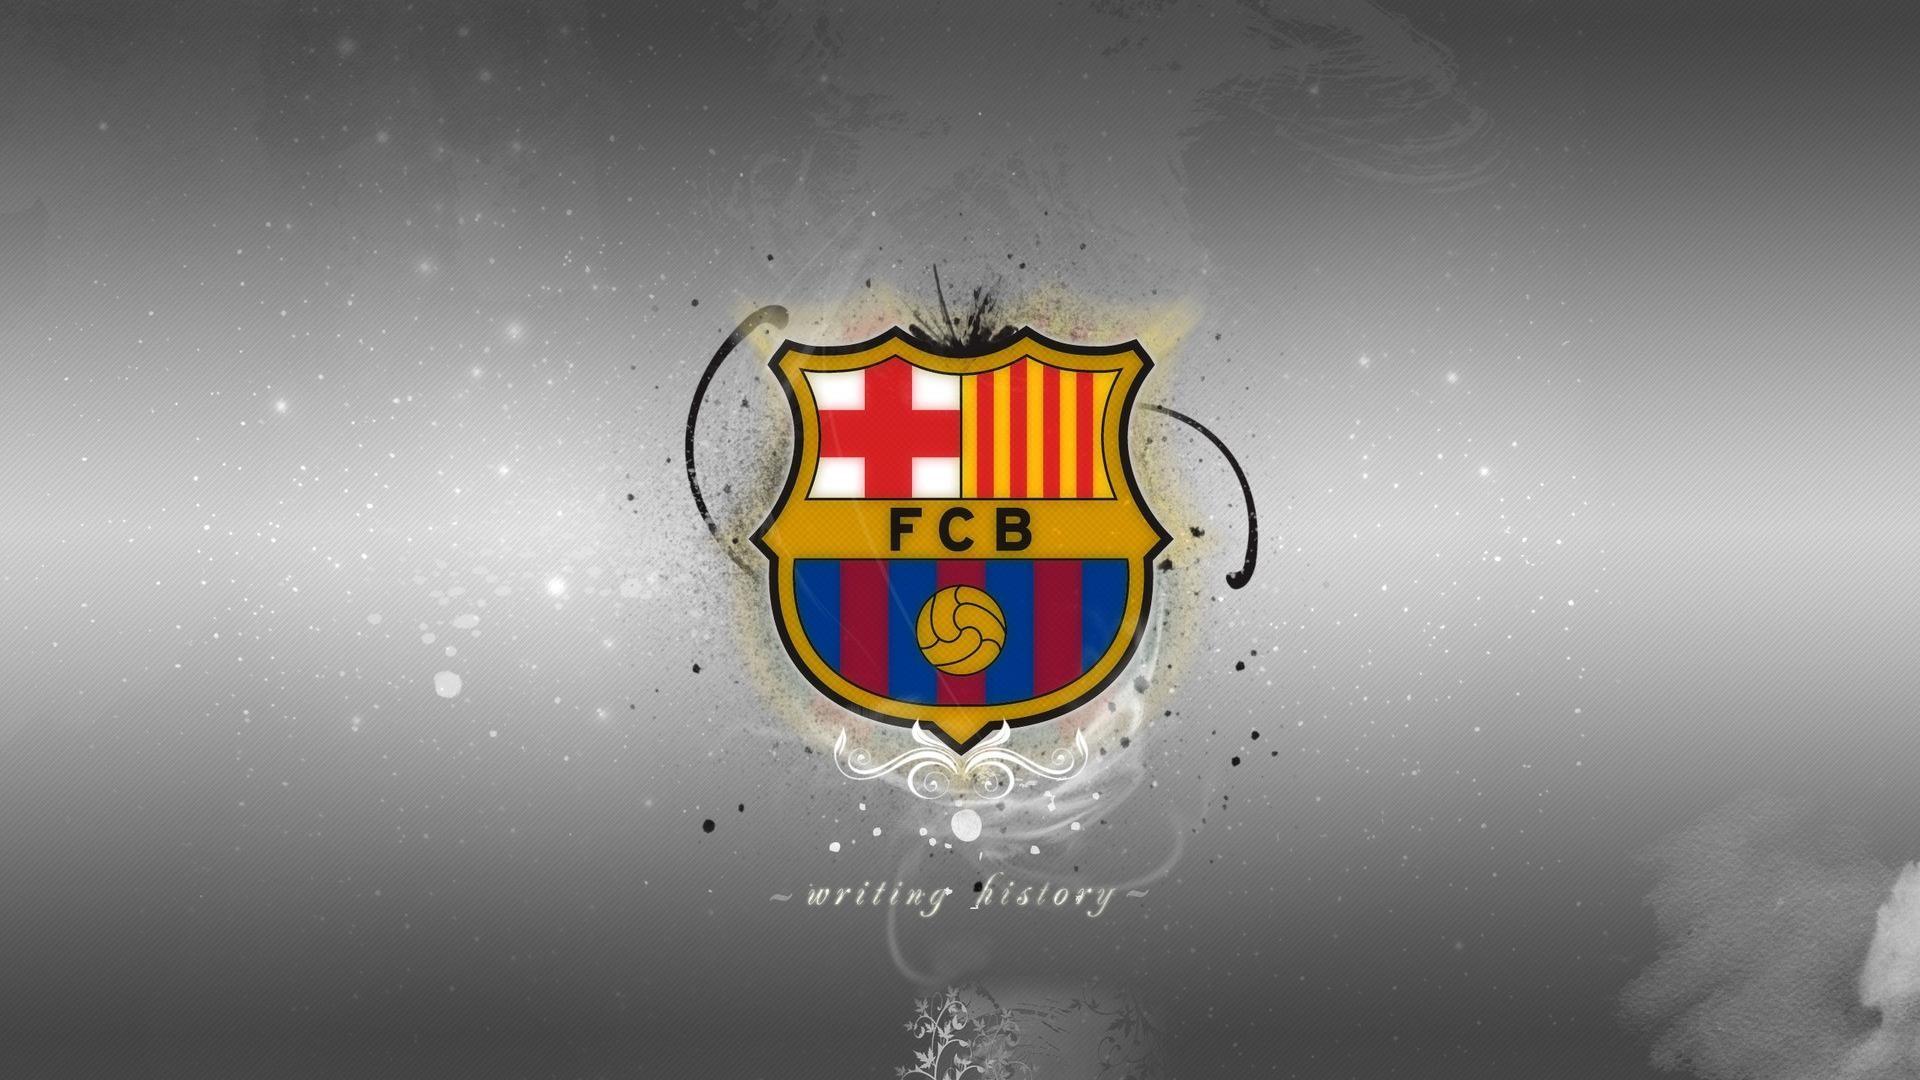 Fc Barcelona Wallpaper HD 2018 (68+ images)